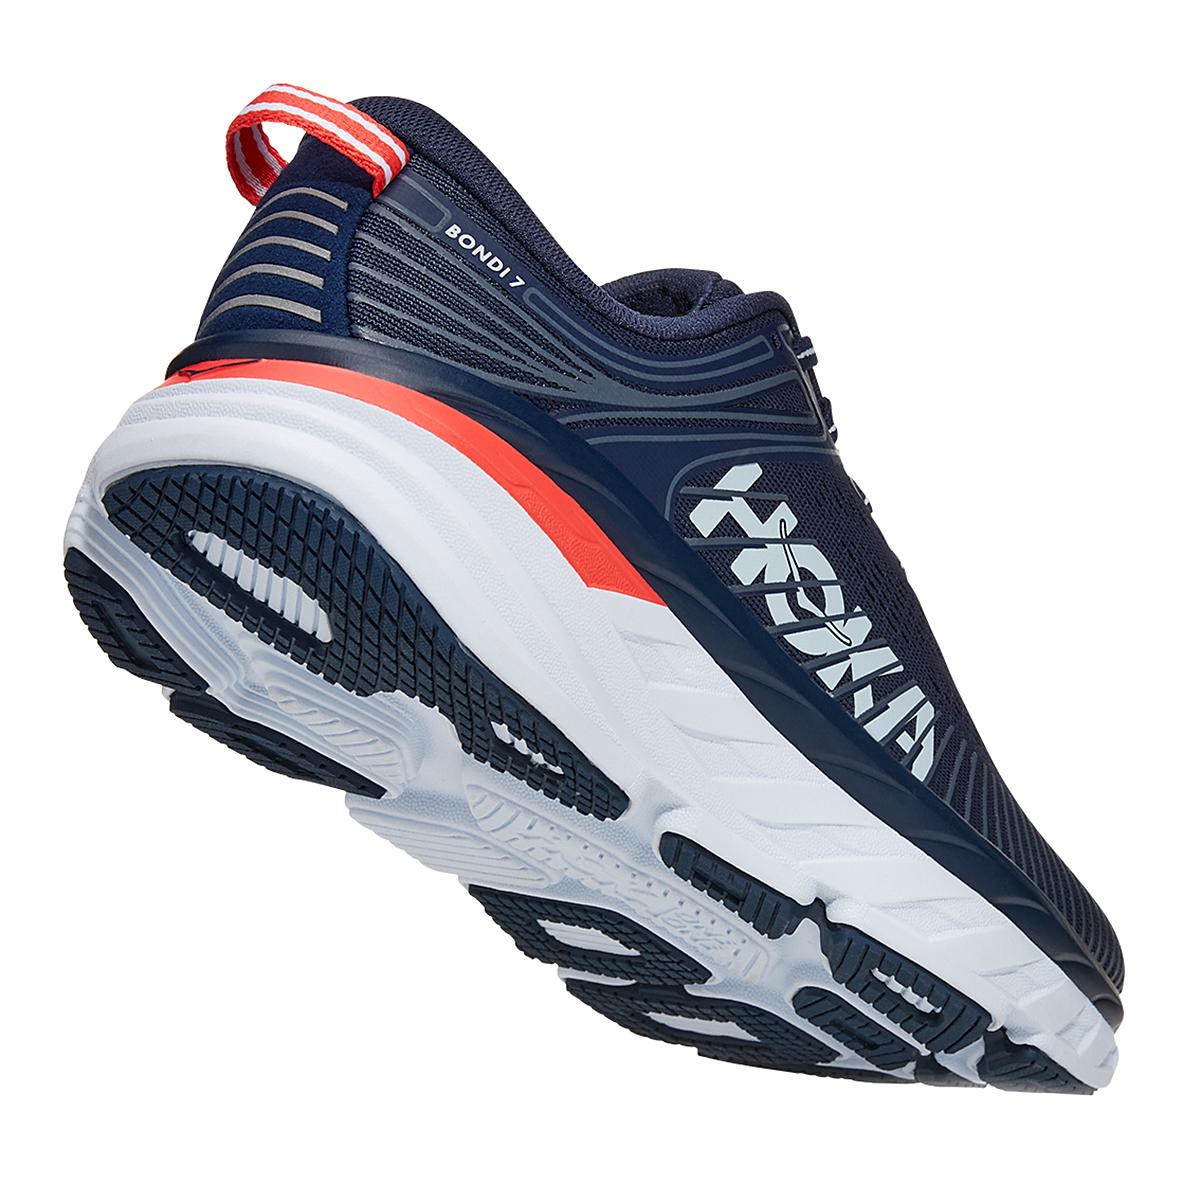 Women's Hoka One One Bondi 7 Running Shoe - Color: Black Iris/Ballad Blue - Size: 6 - Width: Regular, Black Iris/Ballad Blue, large, image 3